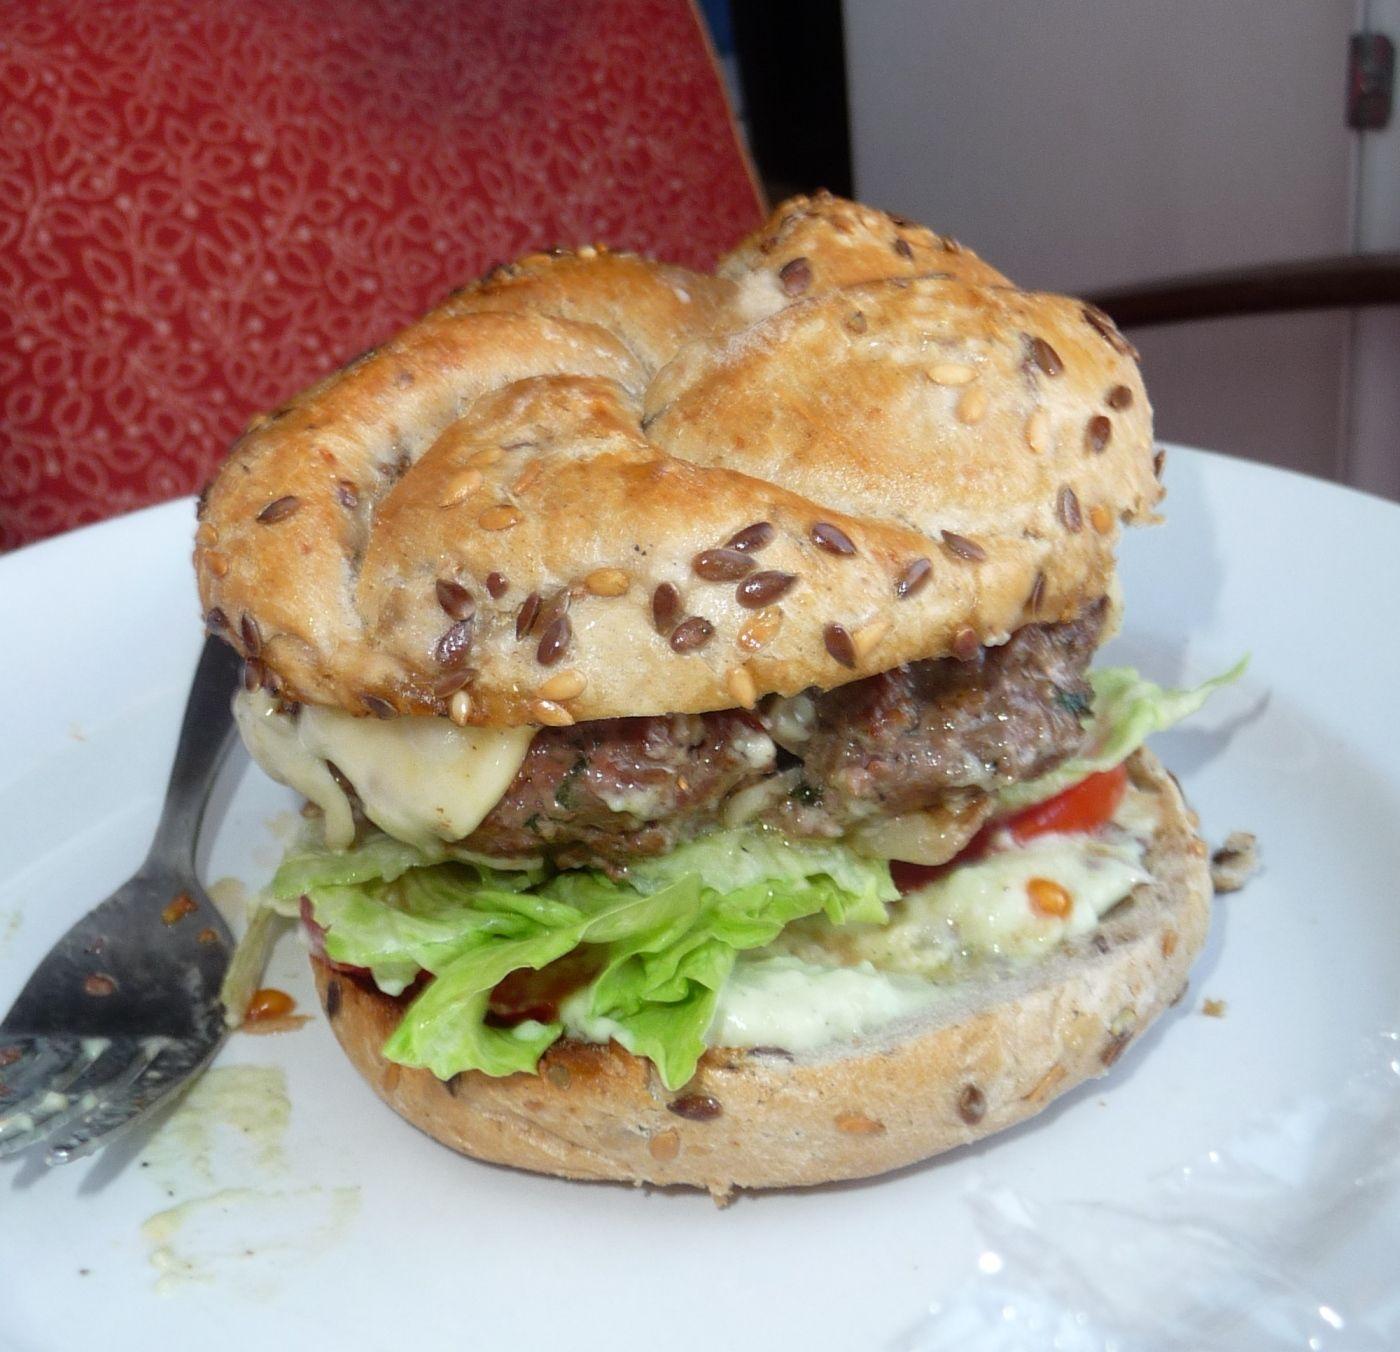 Hamburger from grill